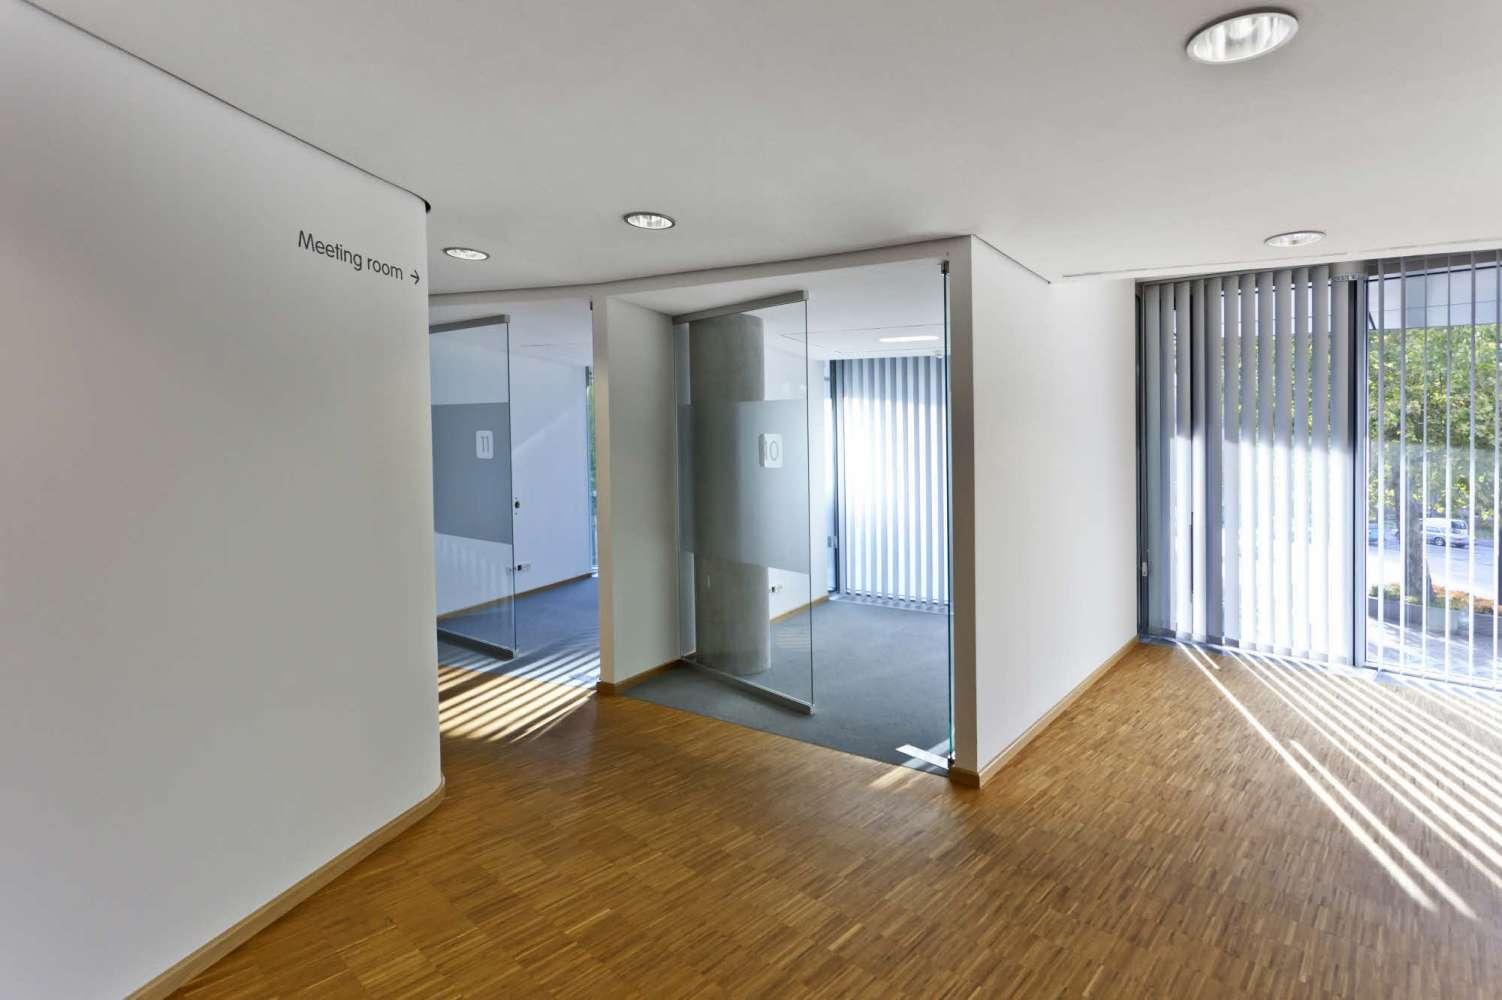 Büros Frankfurt am main, 60329 - Büro - Frankfurt am Main, Gutleutviertel - F0636 - 9487933